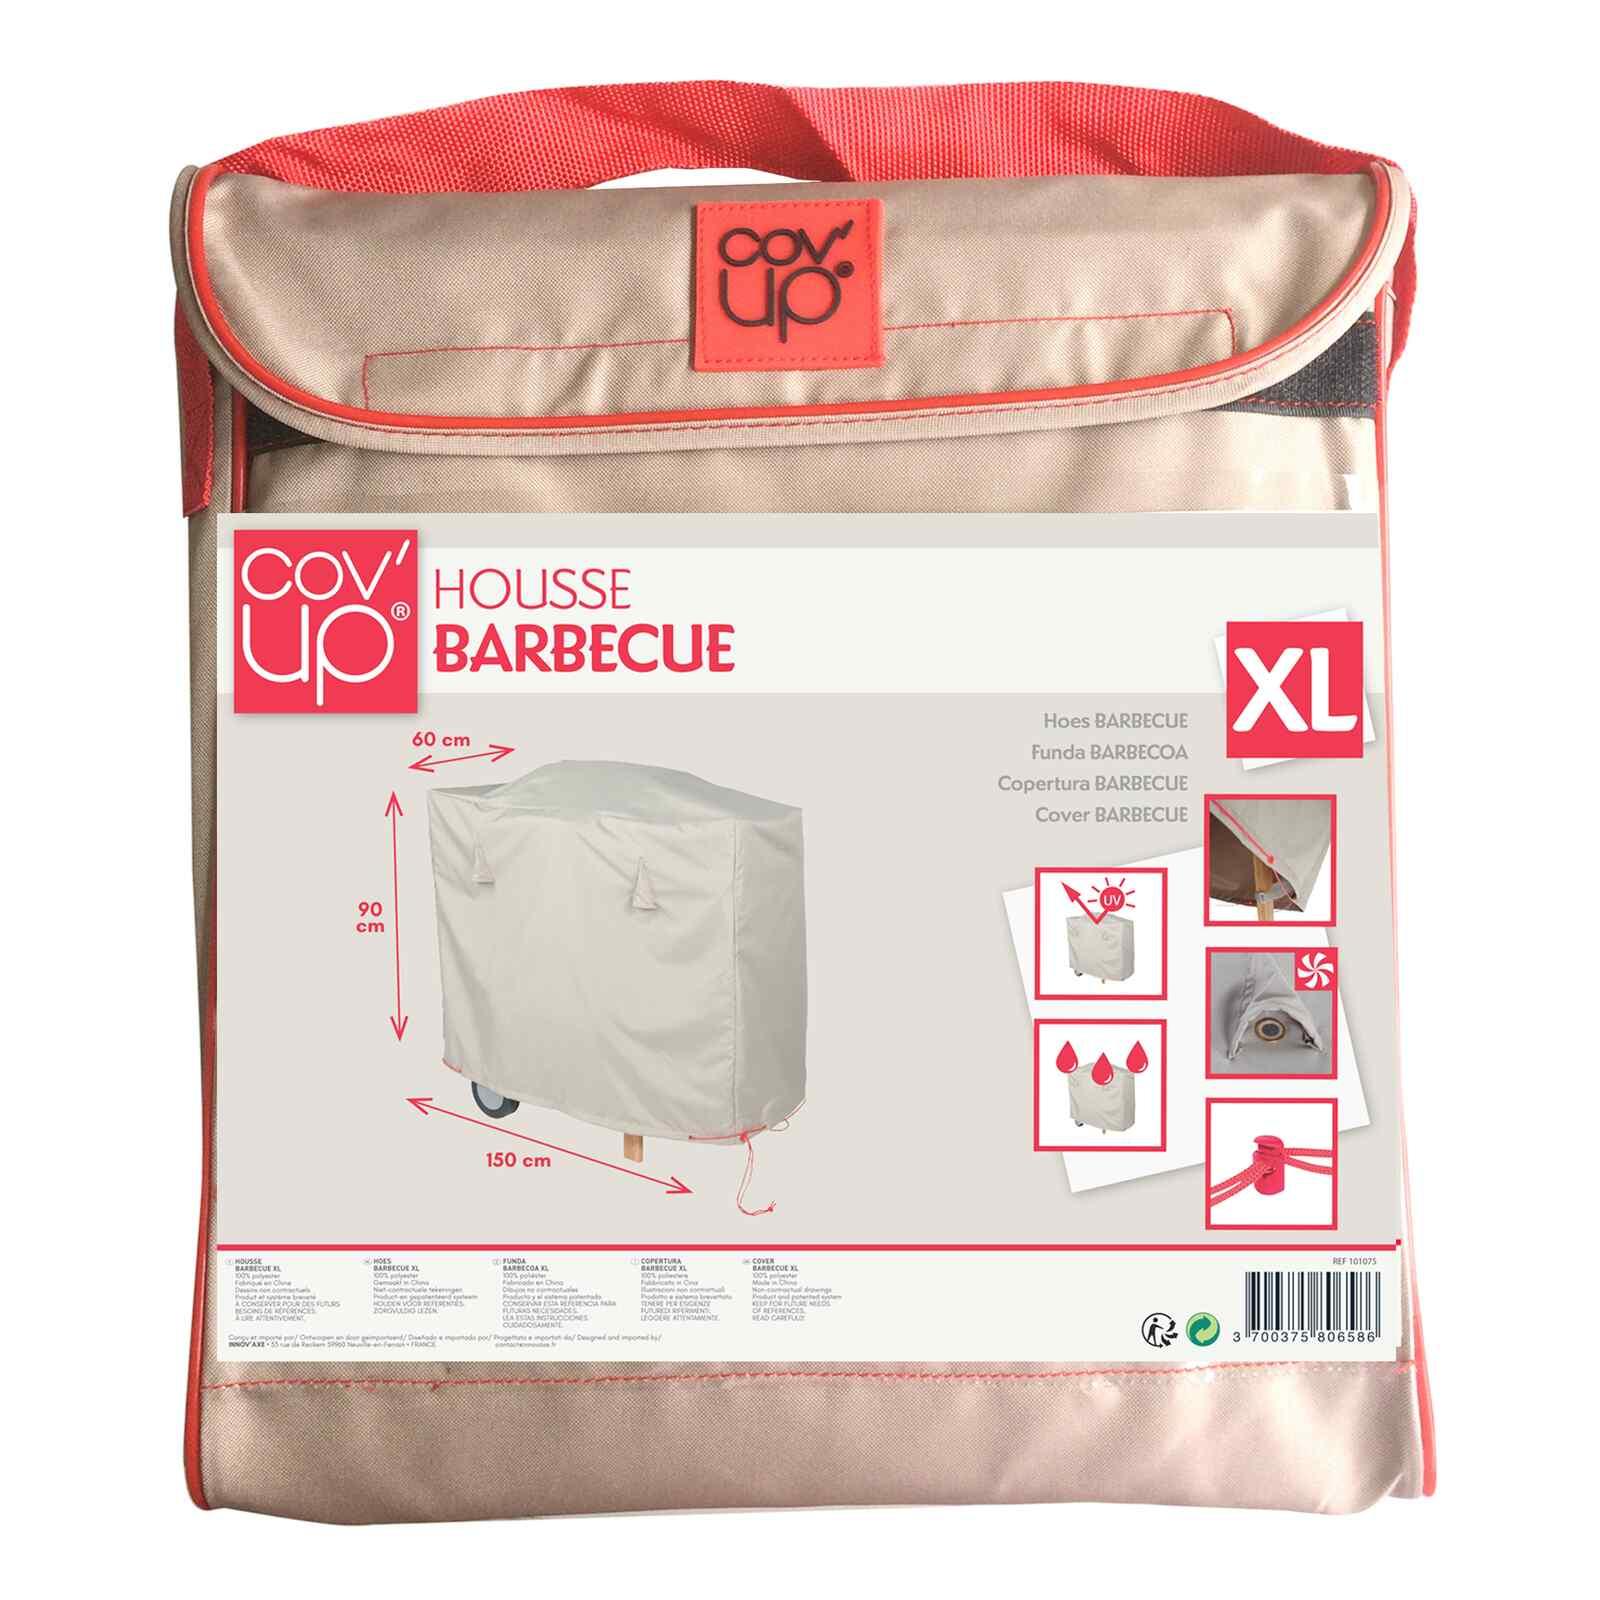 Housse de protection barbecue 150 x 60 cm XL, Cov'Up